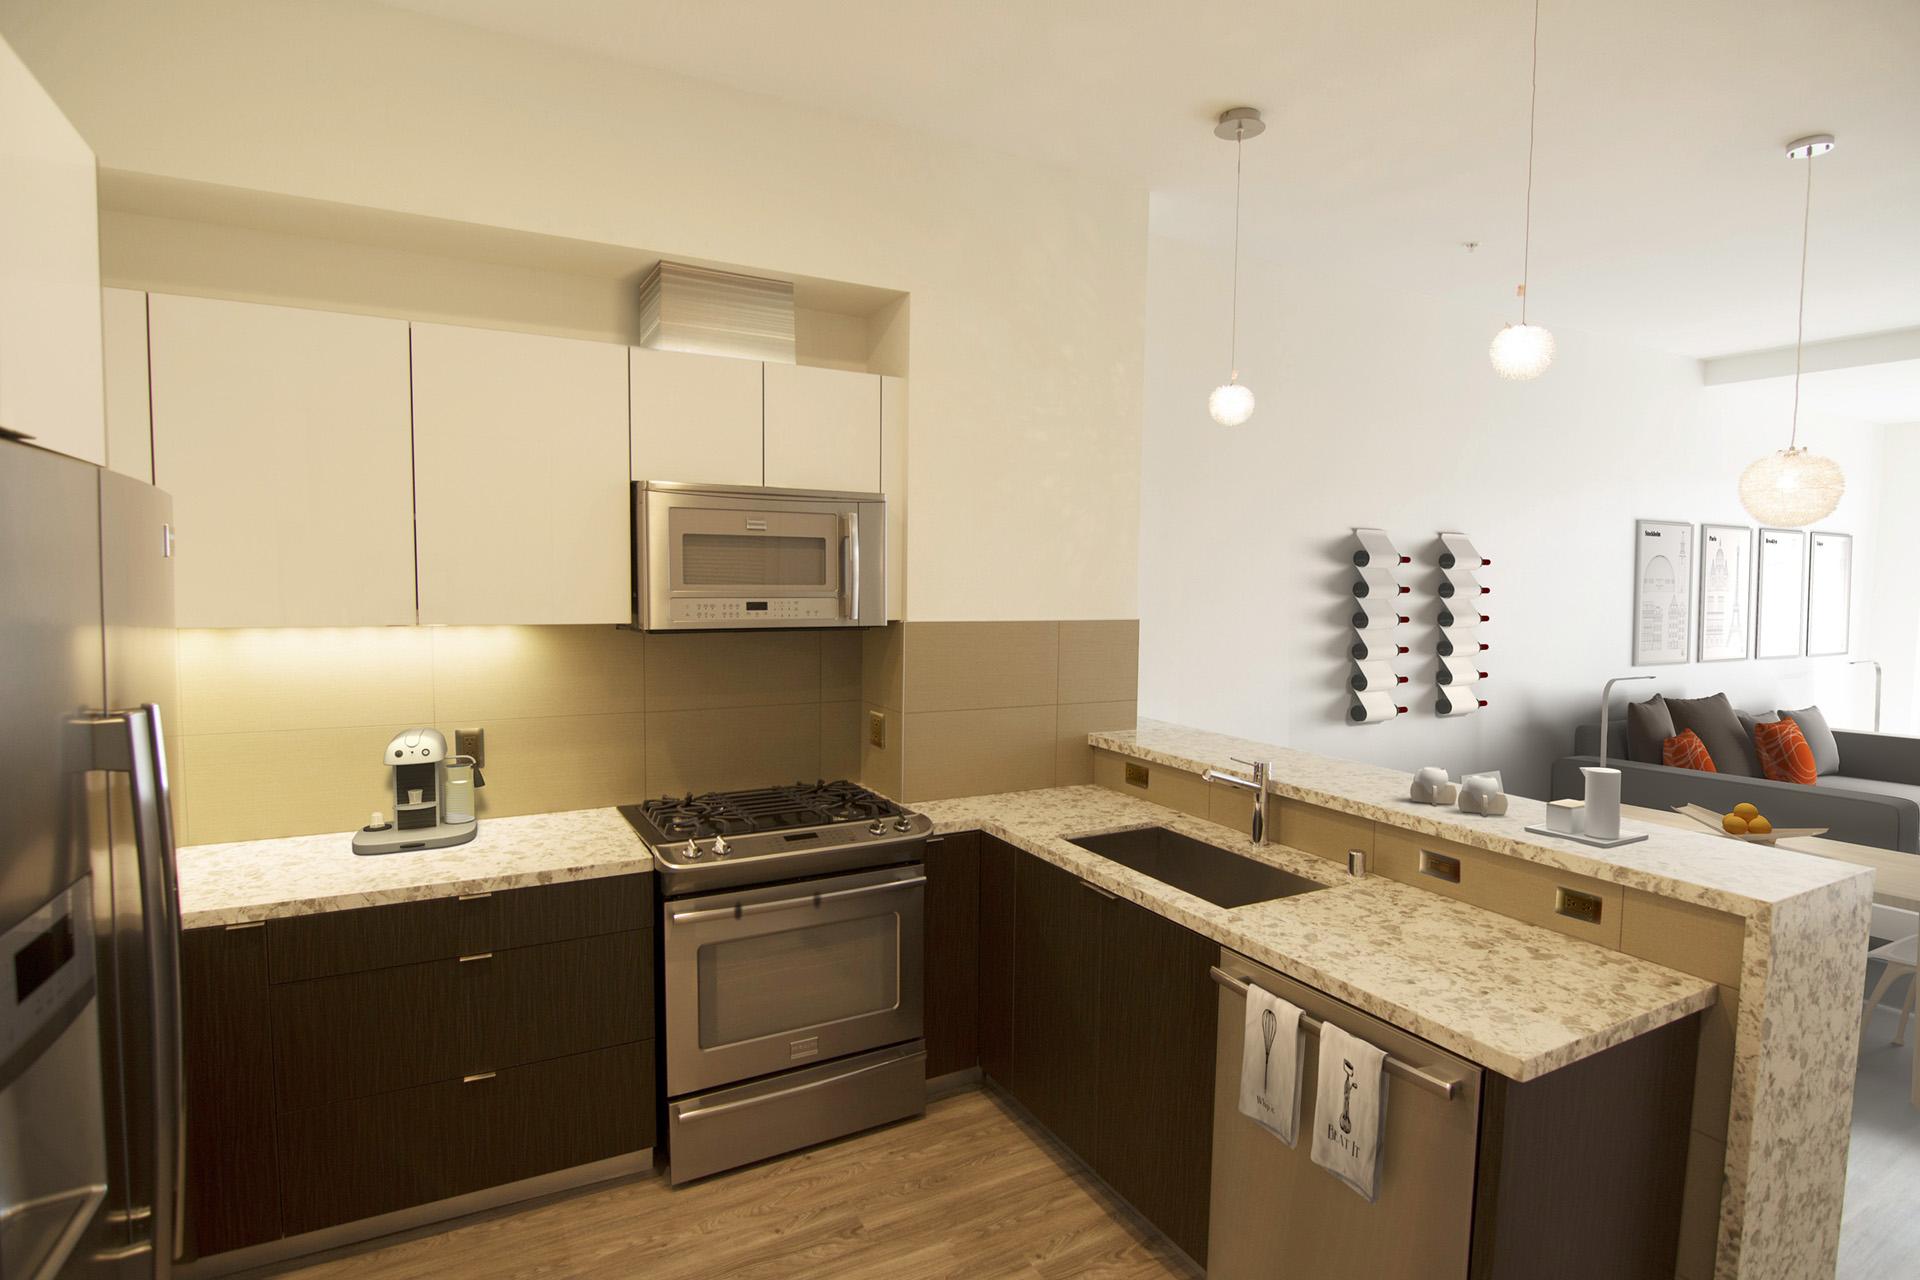 Apartments Westwood, Los Angeles - Gayley & Lindbrook New Kitchen Appliances